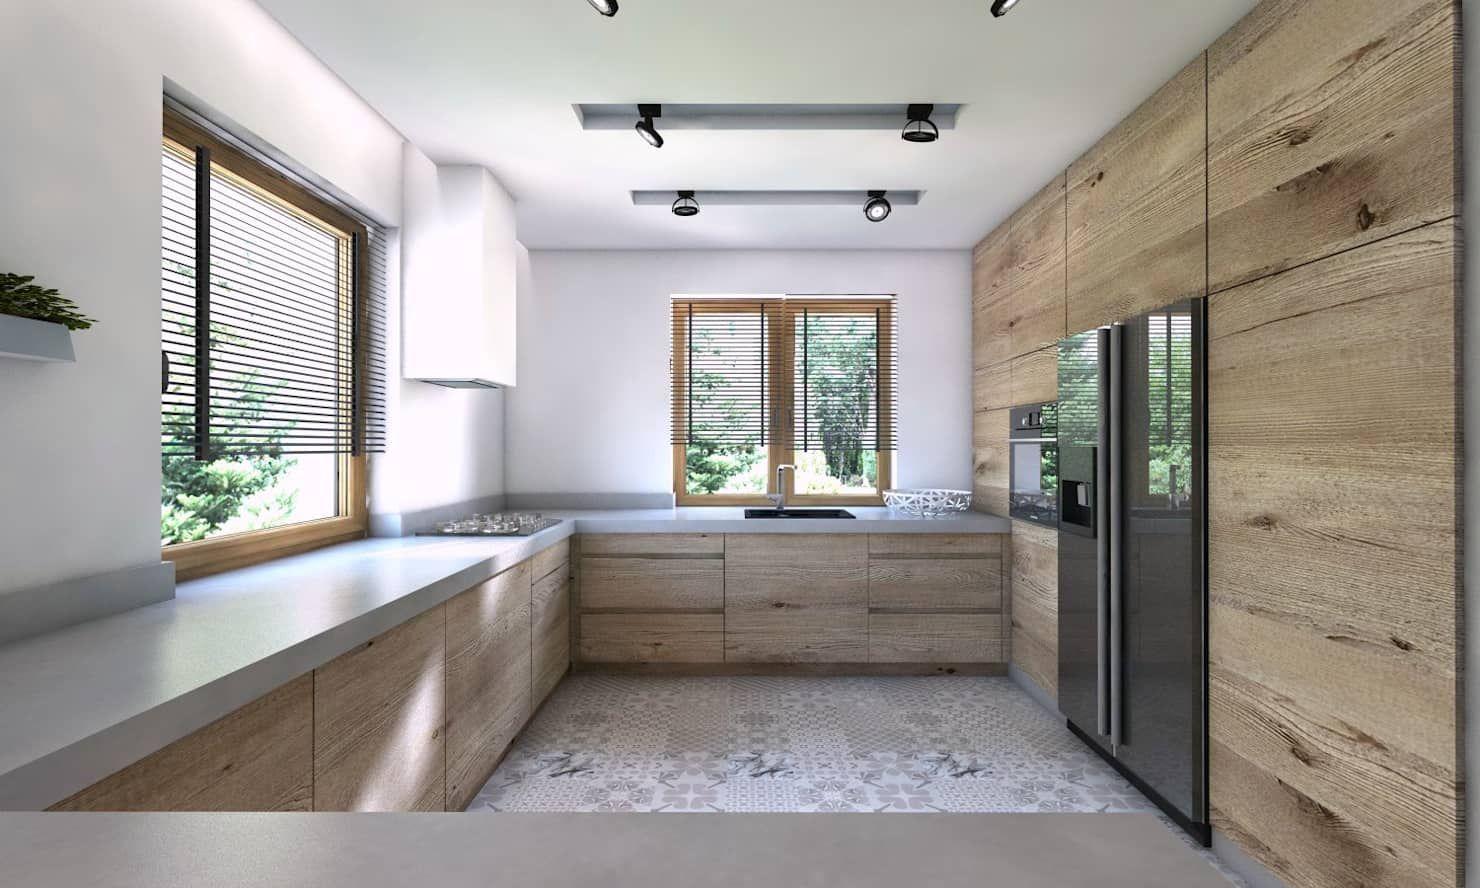 Projekt Domu Jednorodzinnego 5 Bagua Pracownia Architektury Wnetrz Nowoczesna Kuchnia Homify Luxury Kitchens Kitchen Furniture Design Kitchen Design Small